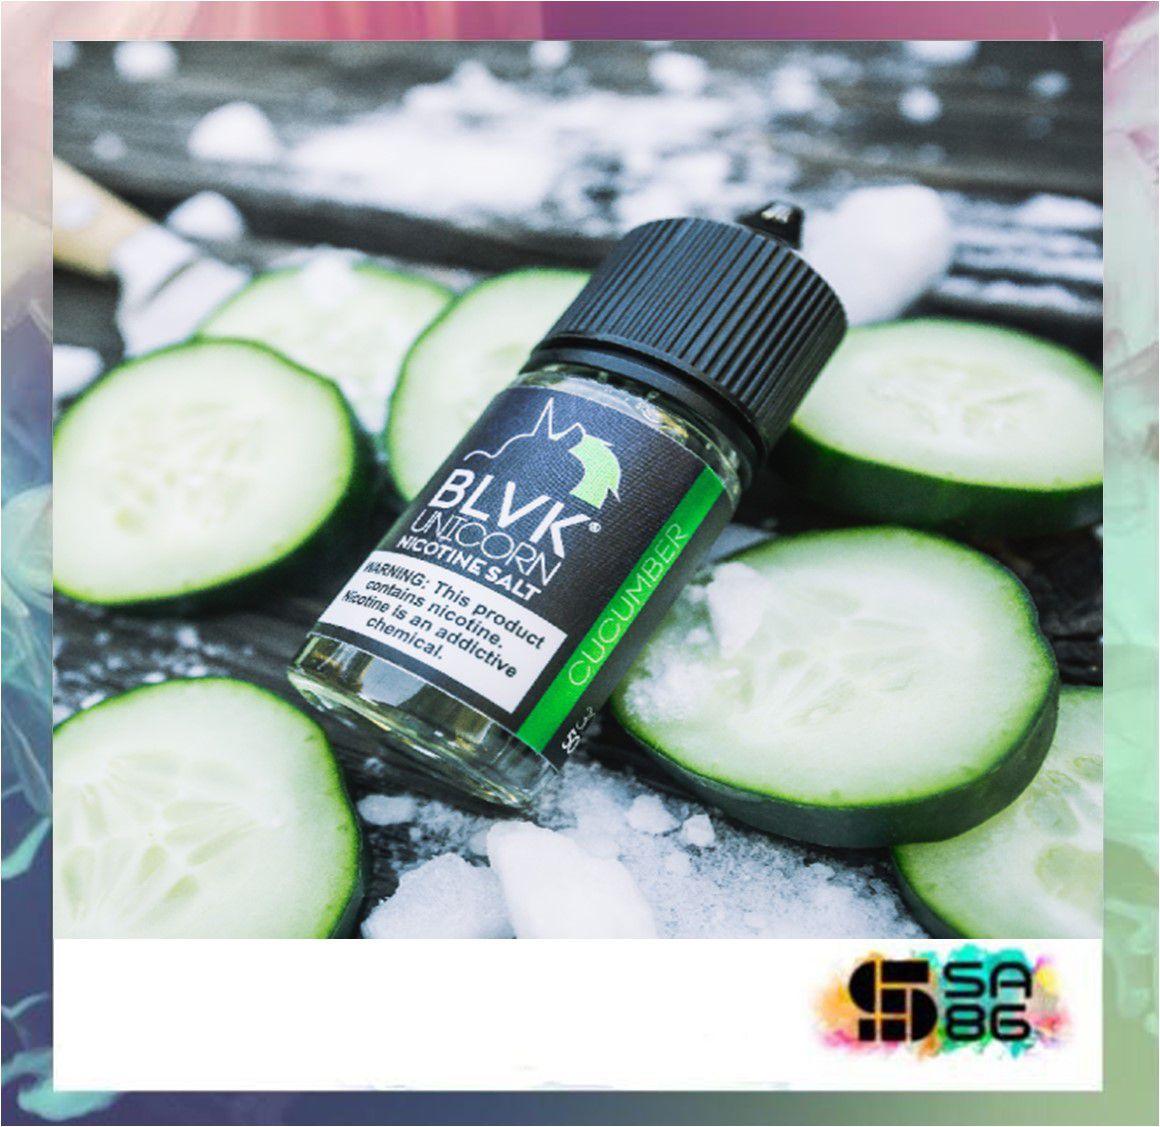 BLVK UNICORN NIC SALT 30 ML - Cucumber